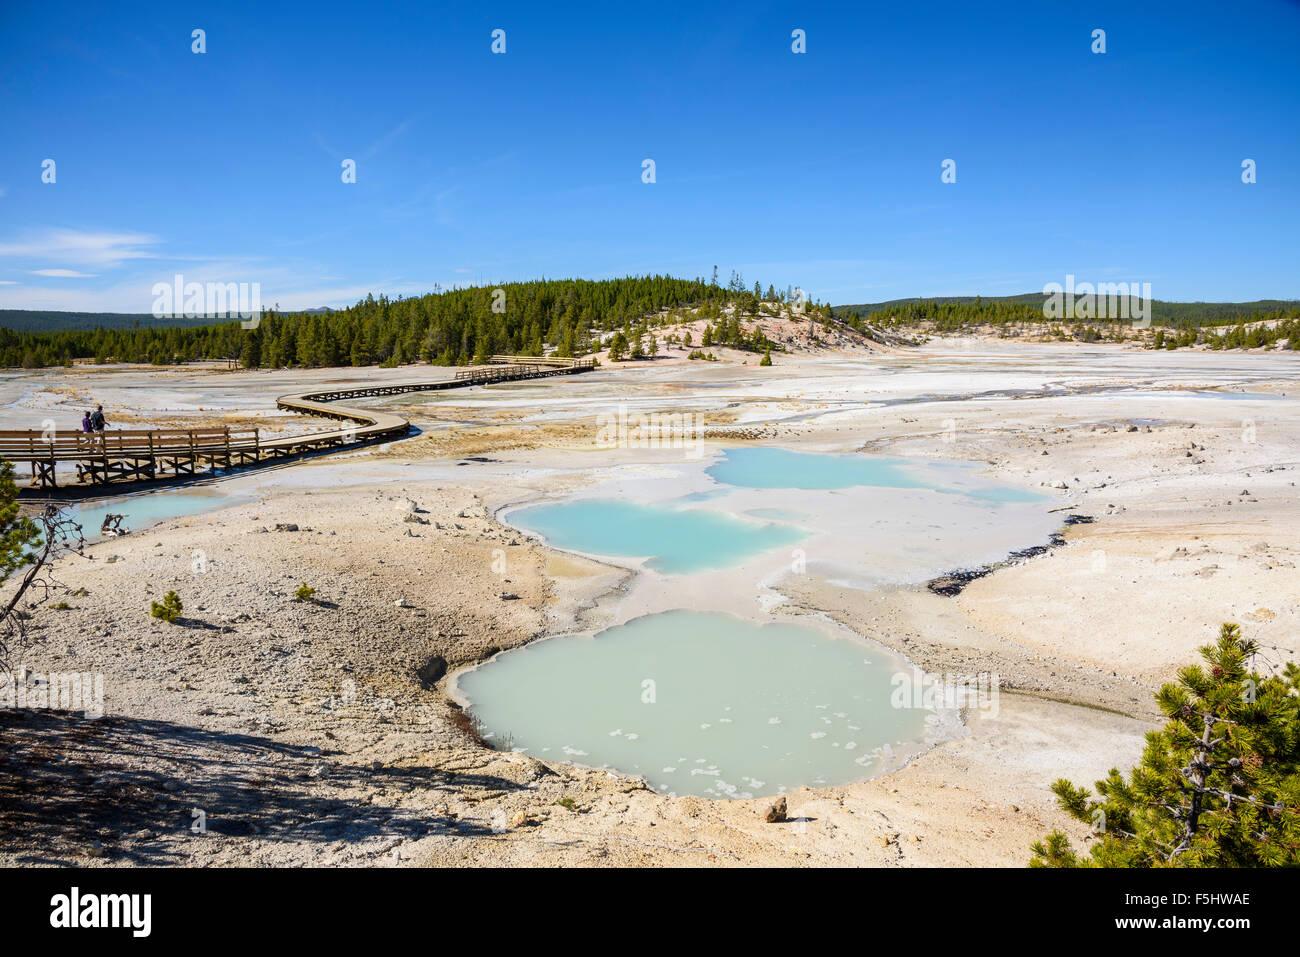 Bassin en porcelaine, Norris Geyser Basin, Parc National de Yellowstone, Wyoming, USA Photo Stock